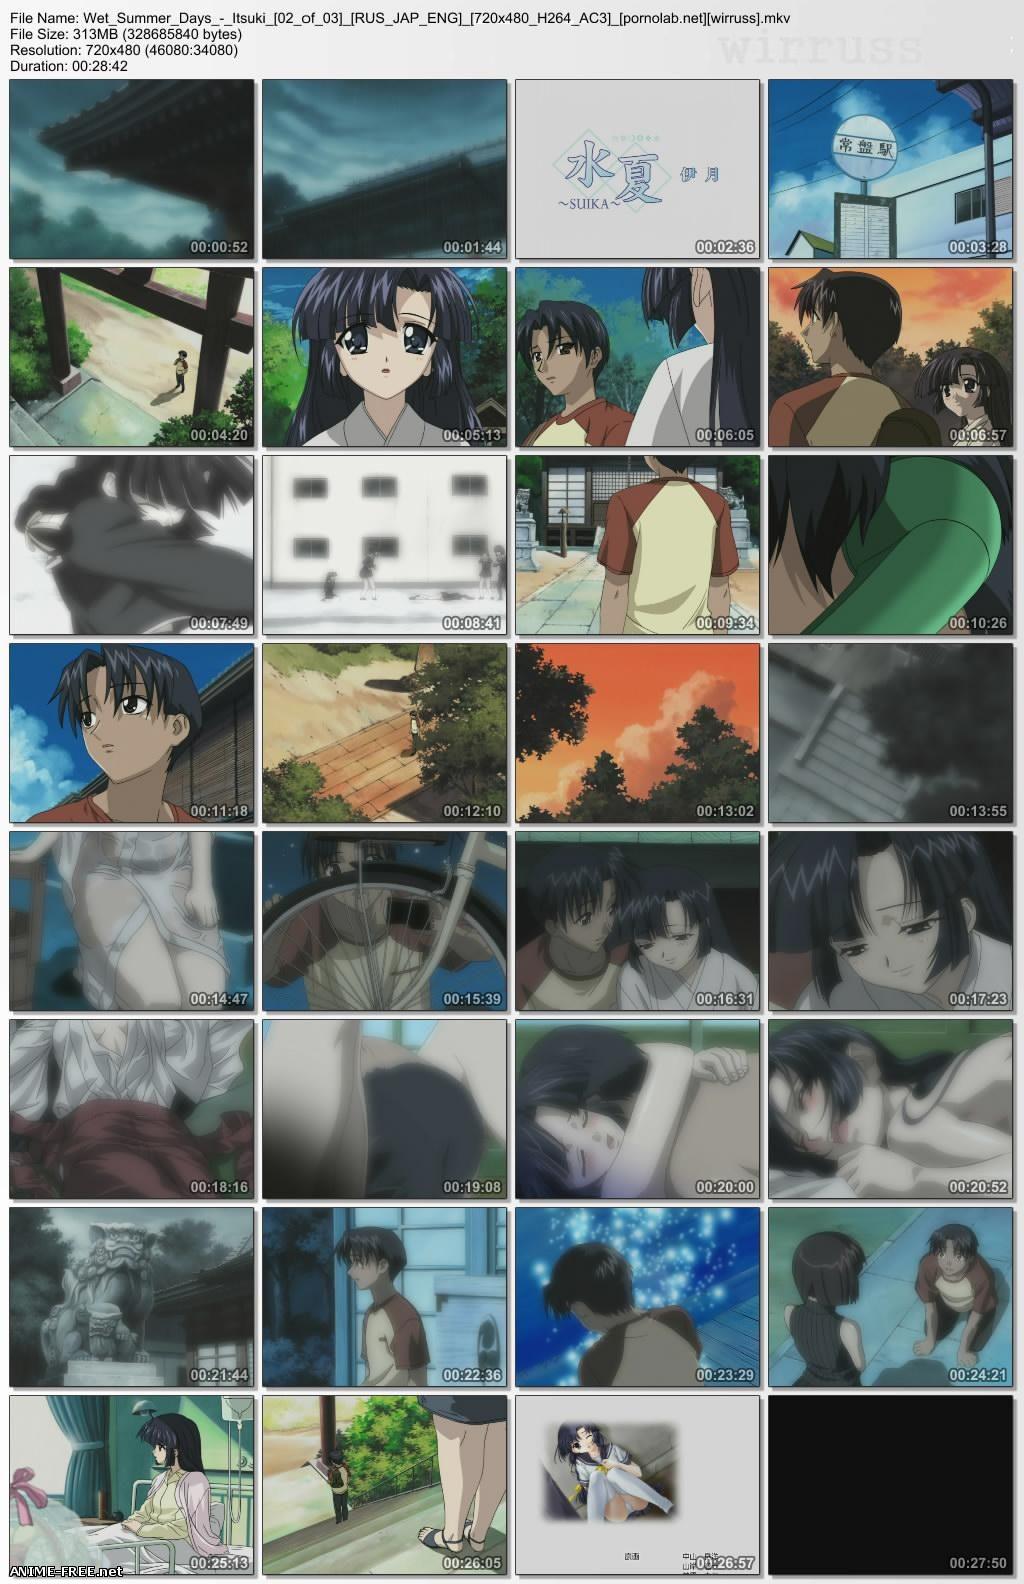 Wet Summer Days / Suika / Влажные дни лета  [Ep.1-3 + 2 SP] [RUS,JAP,ENG] Anime Hentai